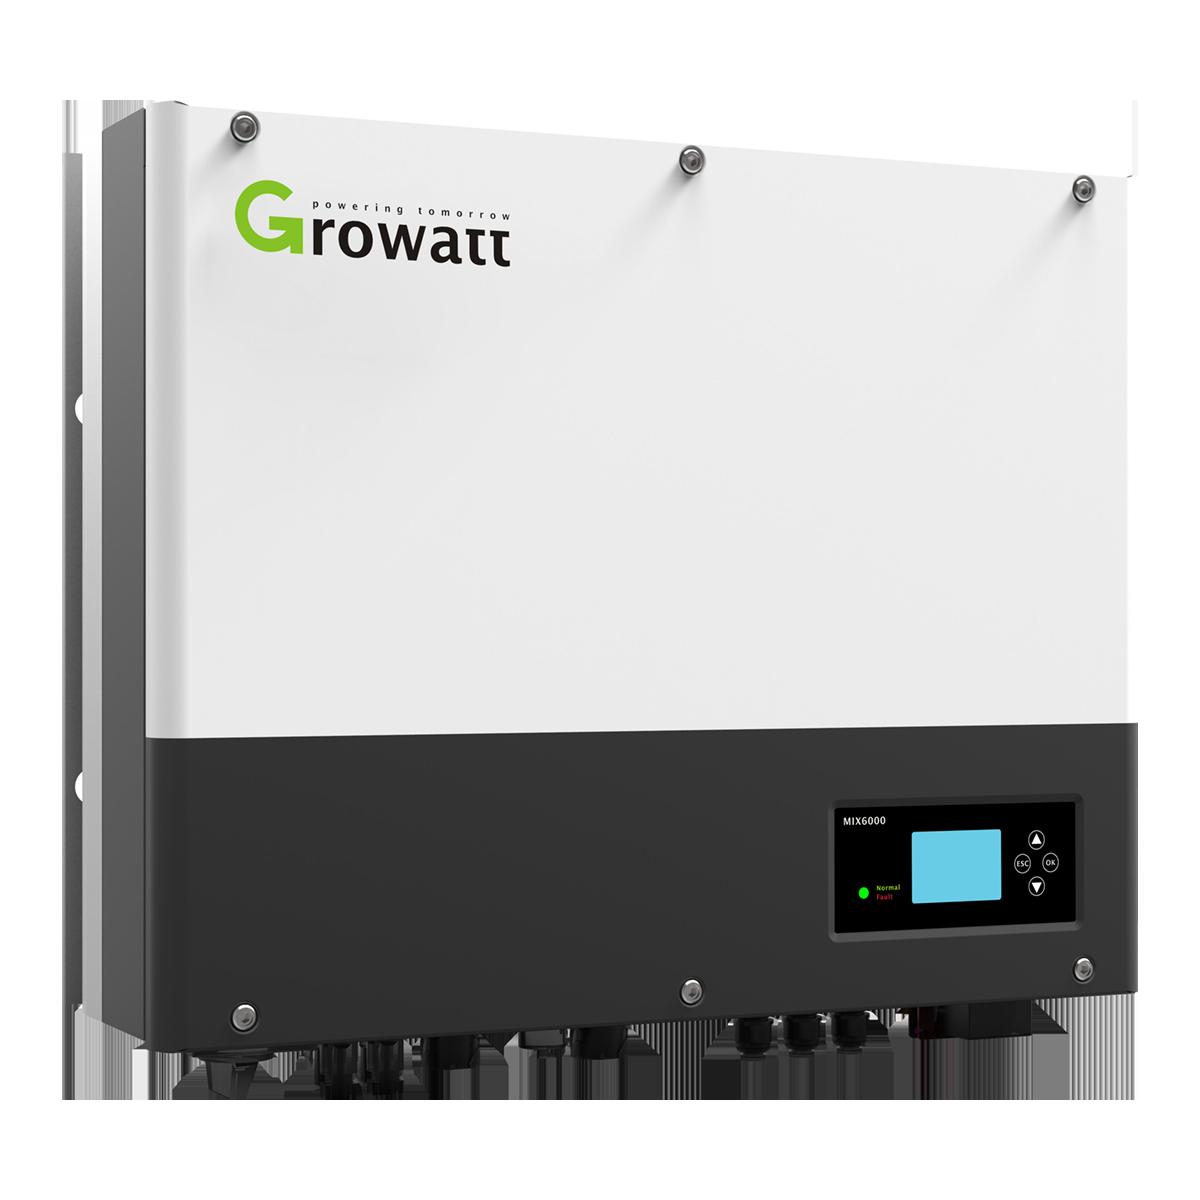 Growatt SPH3600 | Hybride Omvormer | 3,6 kW, 1PH